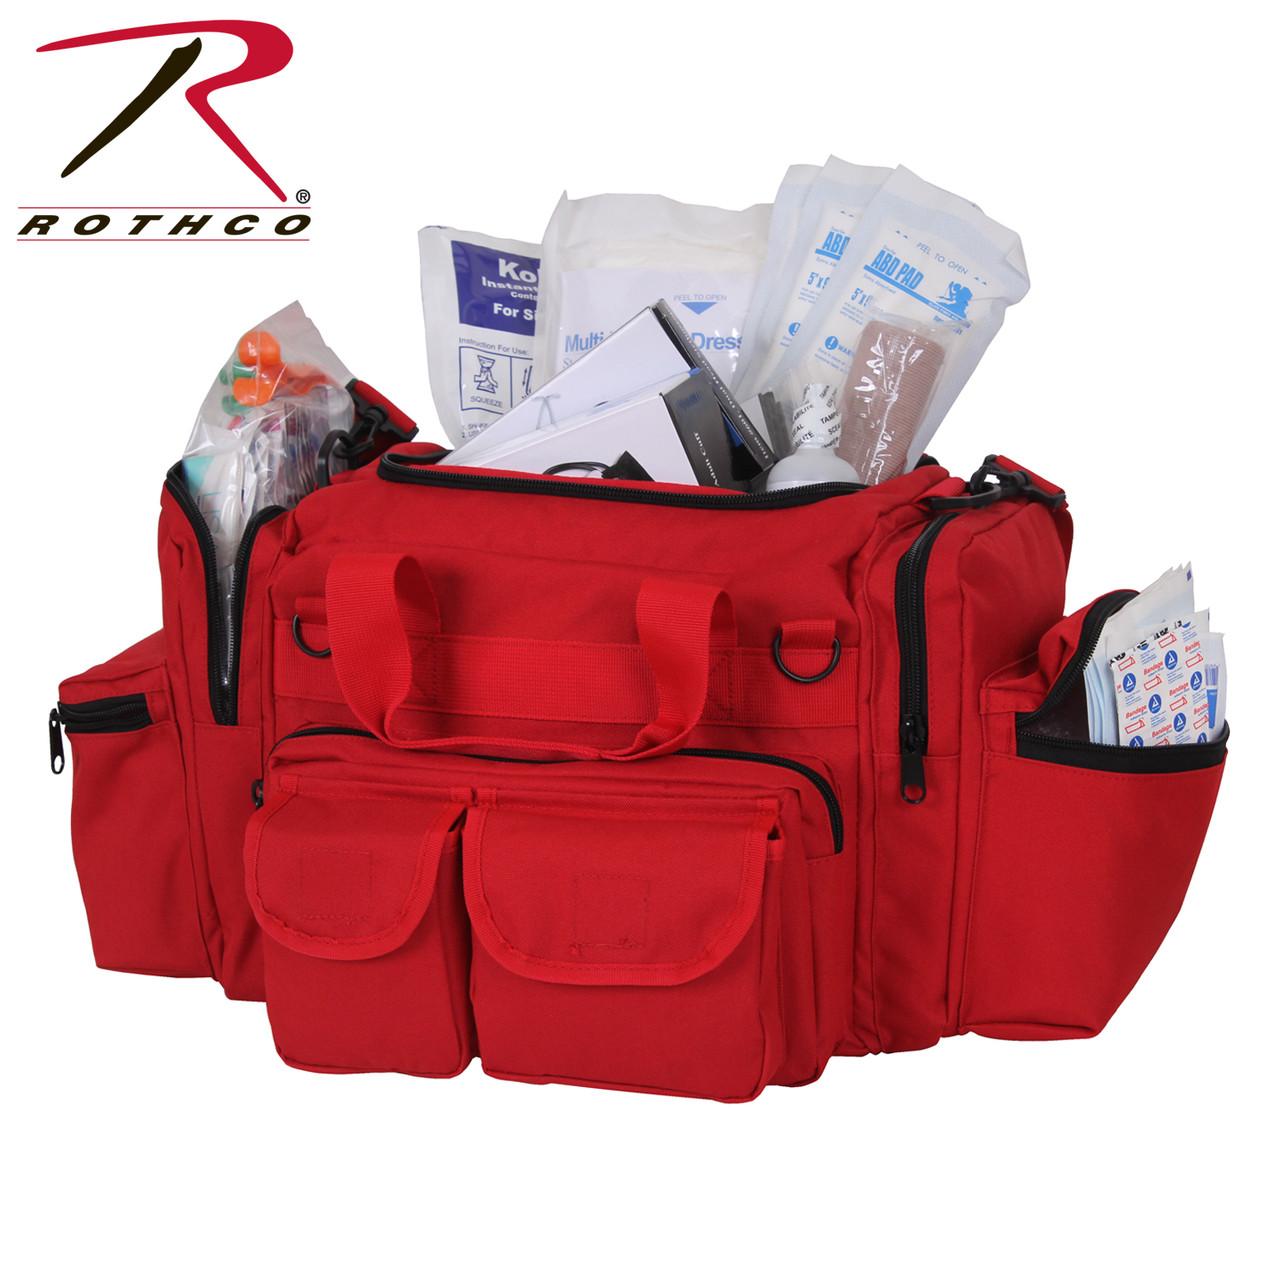 Rothco EMT Medical Trauma Kit Red | Rothco 1145 Red